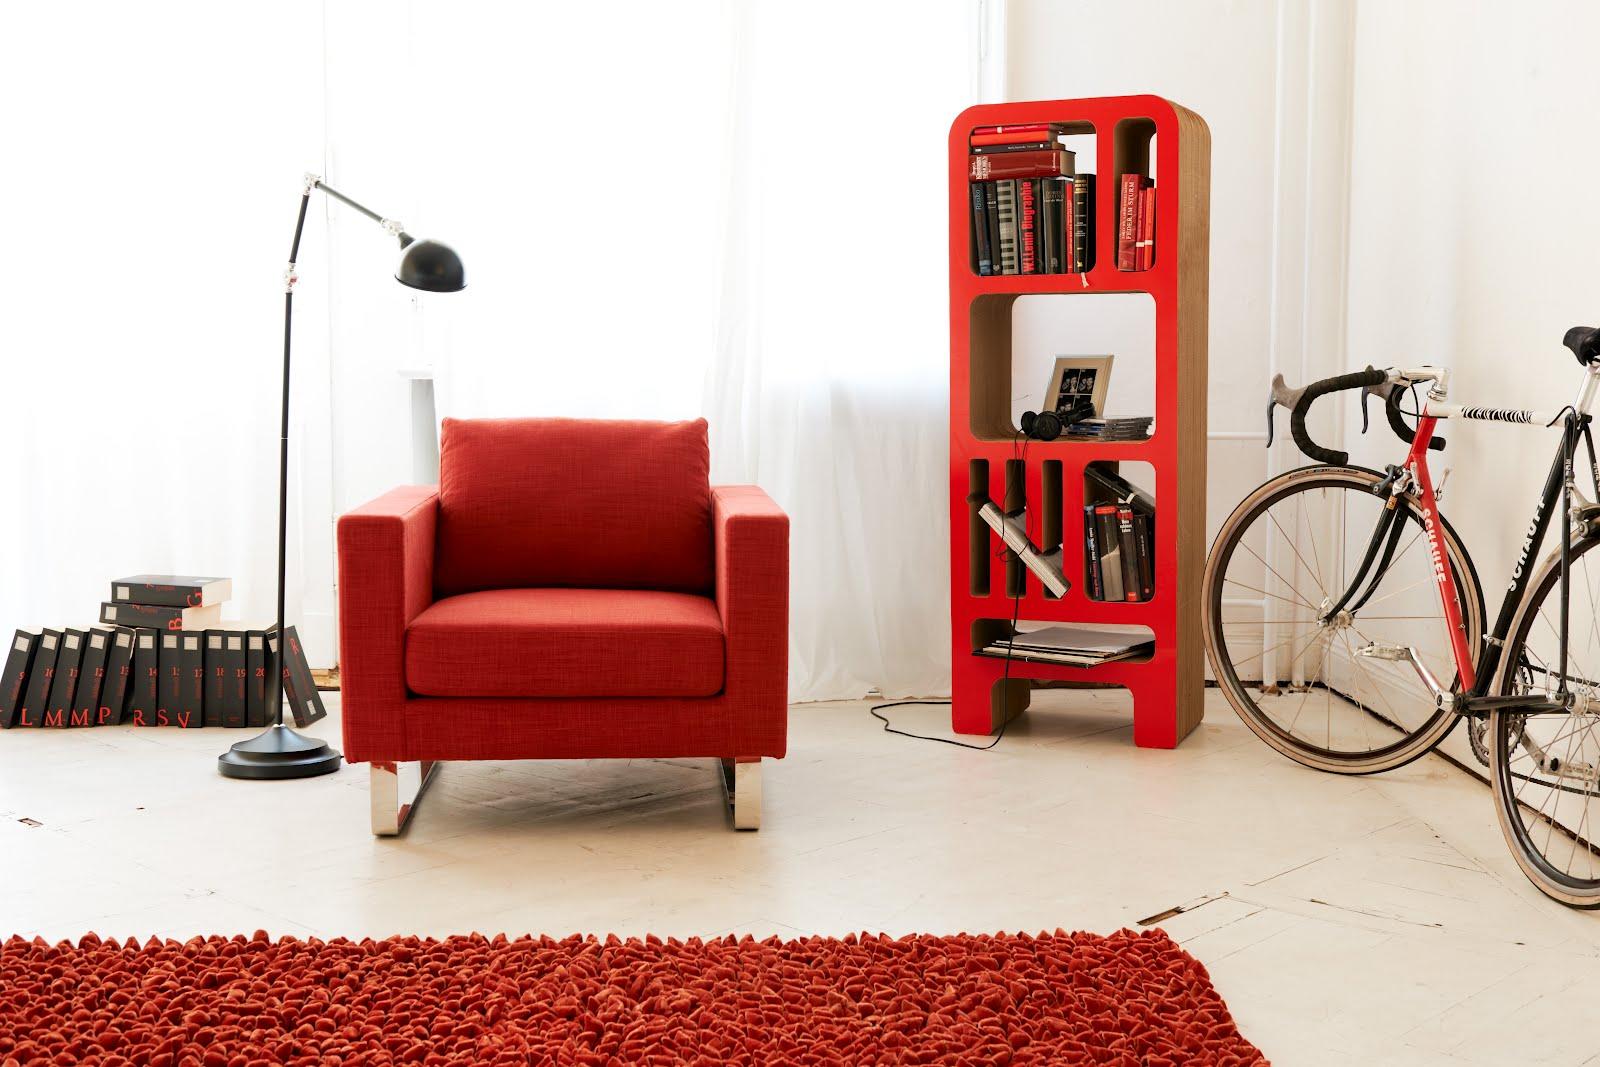 Interior design ideas some affordable furniture design for Affordable furniture outlet